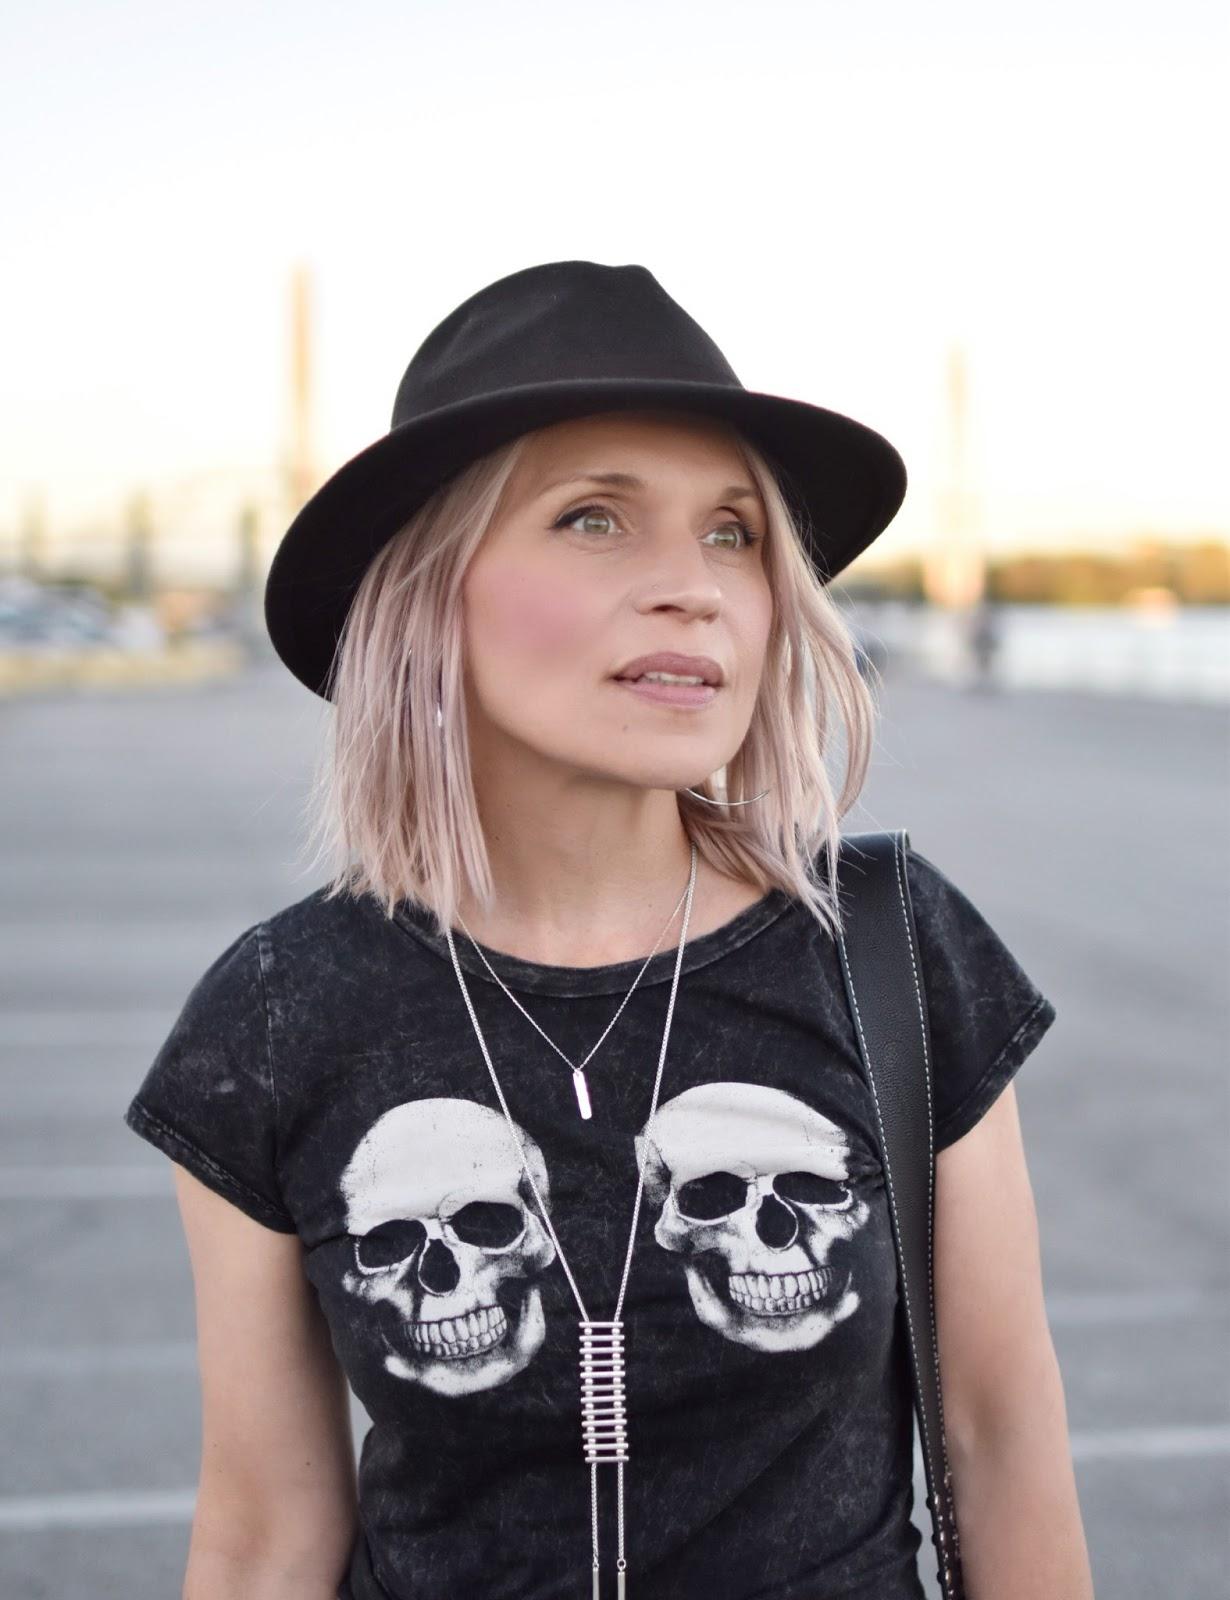 Monika Faulkner outfit inspiration - skull-patterned tee, felt fedora